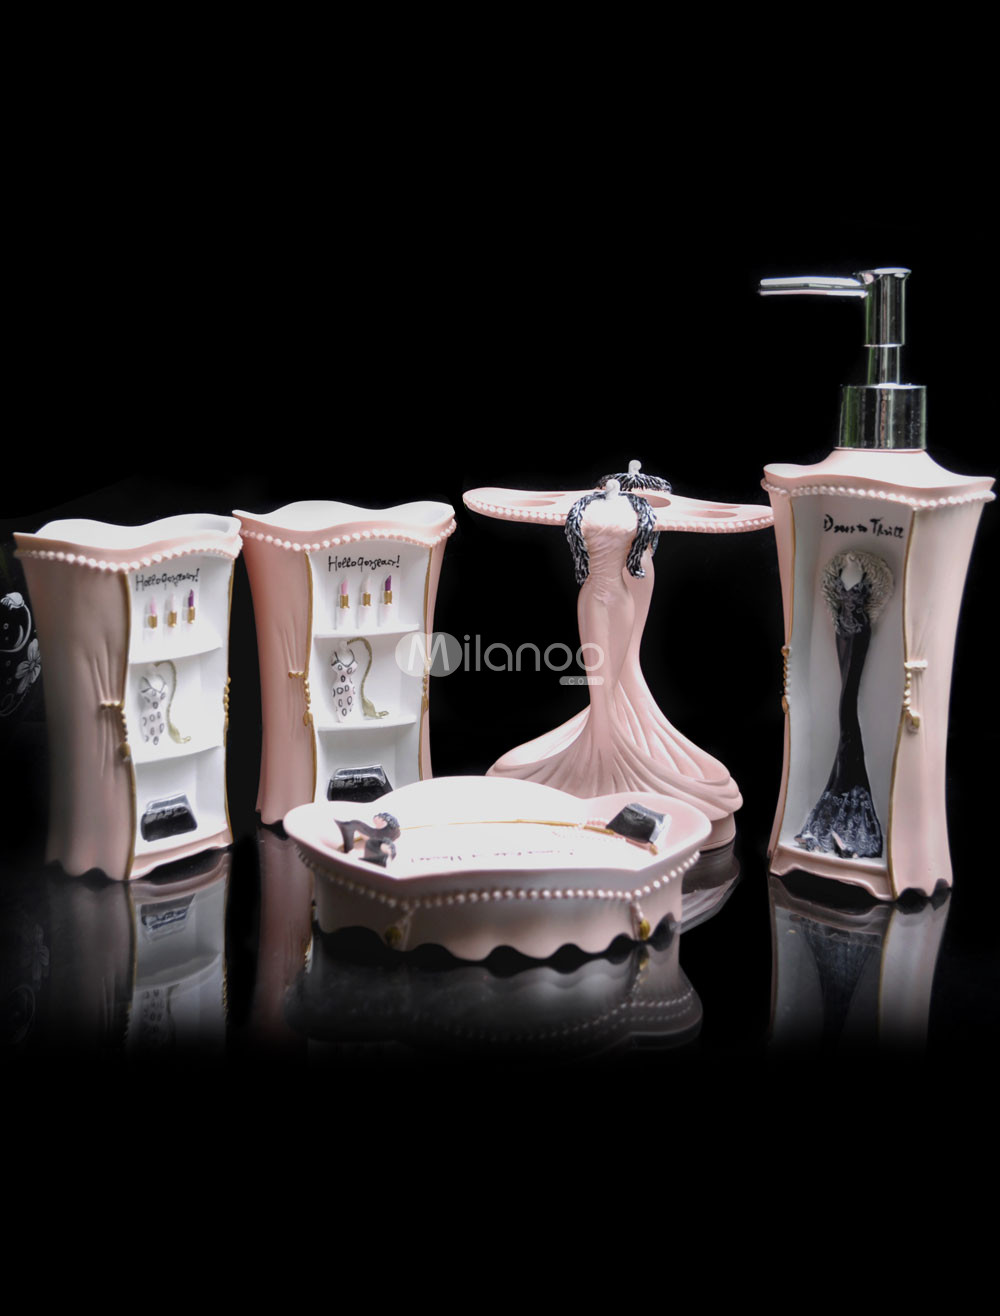 Idee deco salon bleu marine - Accessoires salle de bain rose ...